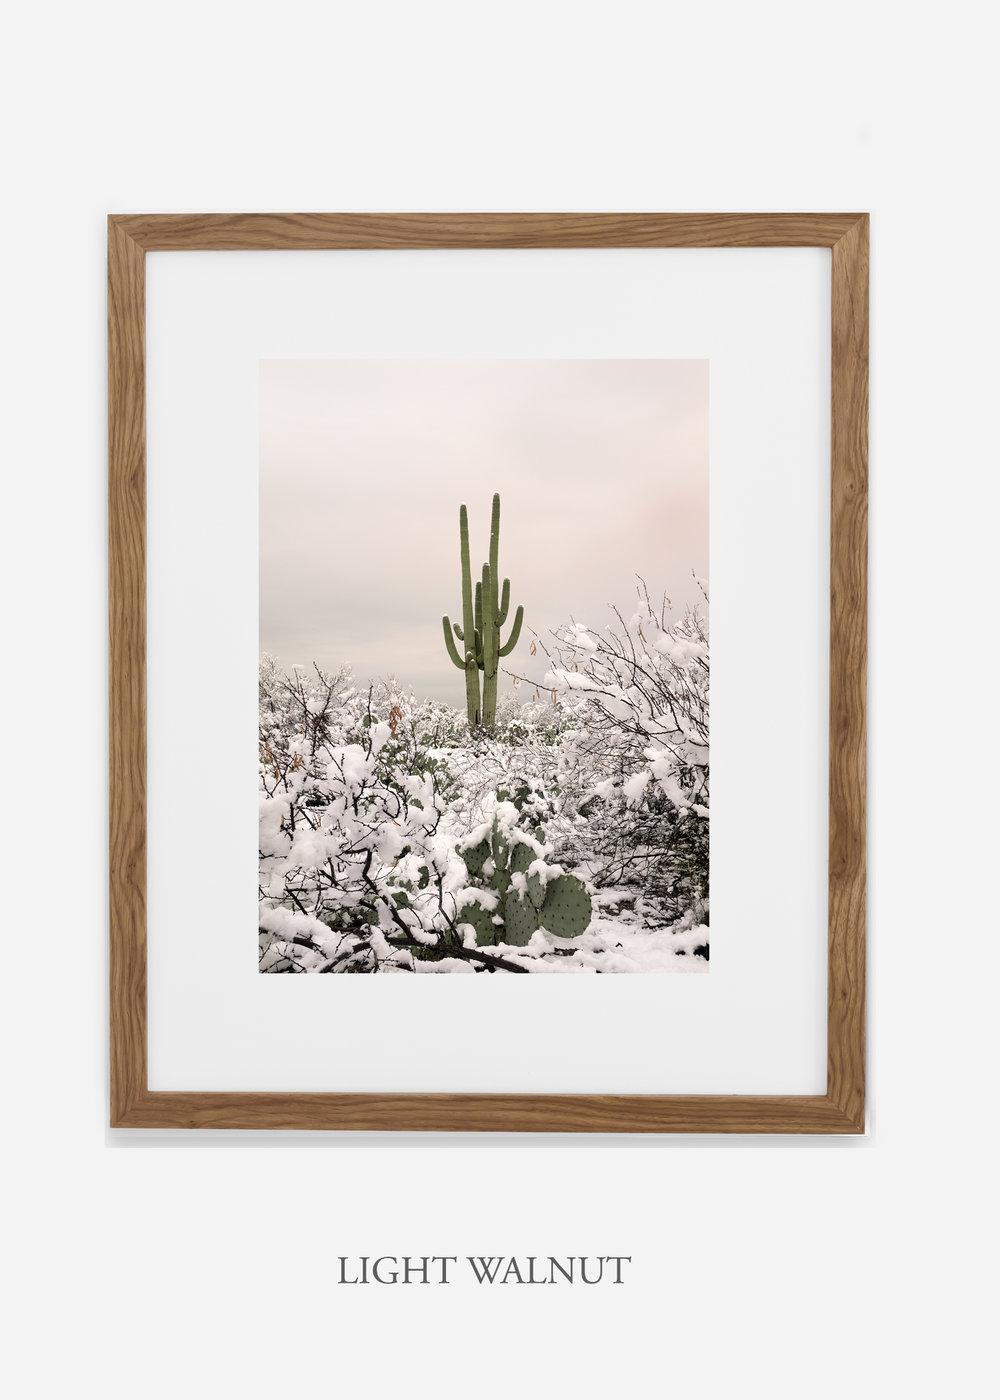 lightwalnutframe-saguaroNo.2-wildercalifornia-art-wallart-cactusprint-homedecor-prints-arizona-botanical-artwork-interiordesign.jpg